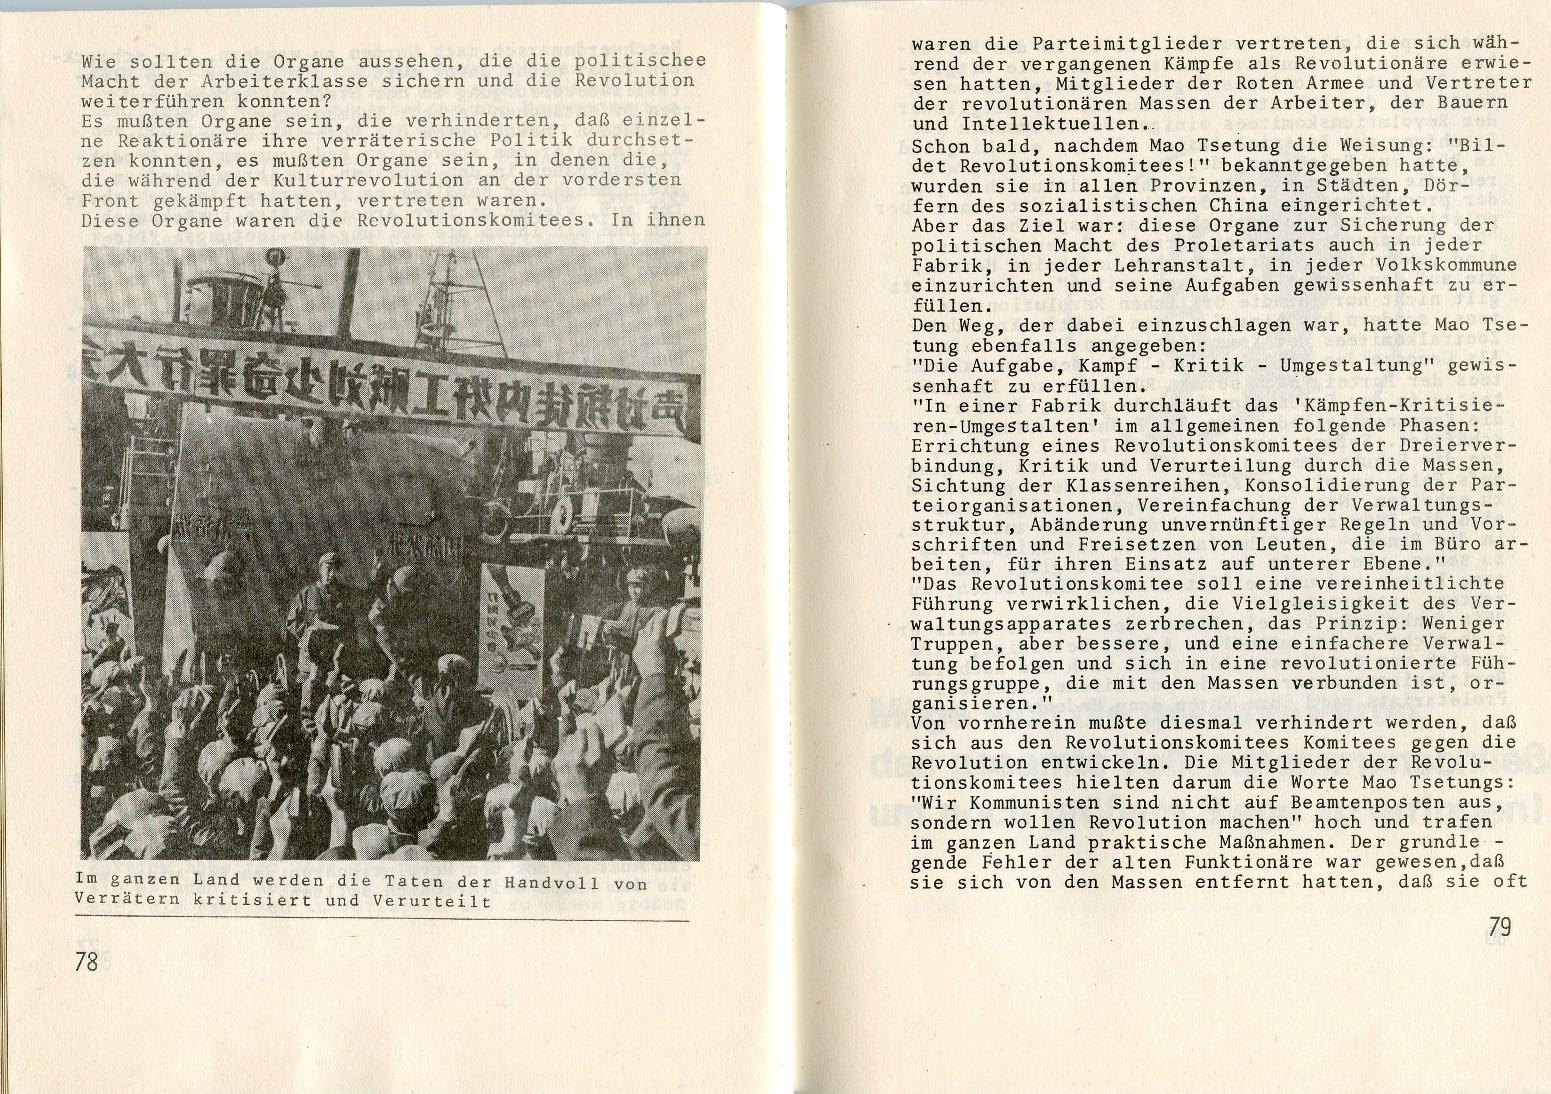 ZB_KPChinas_1971_41